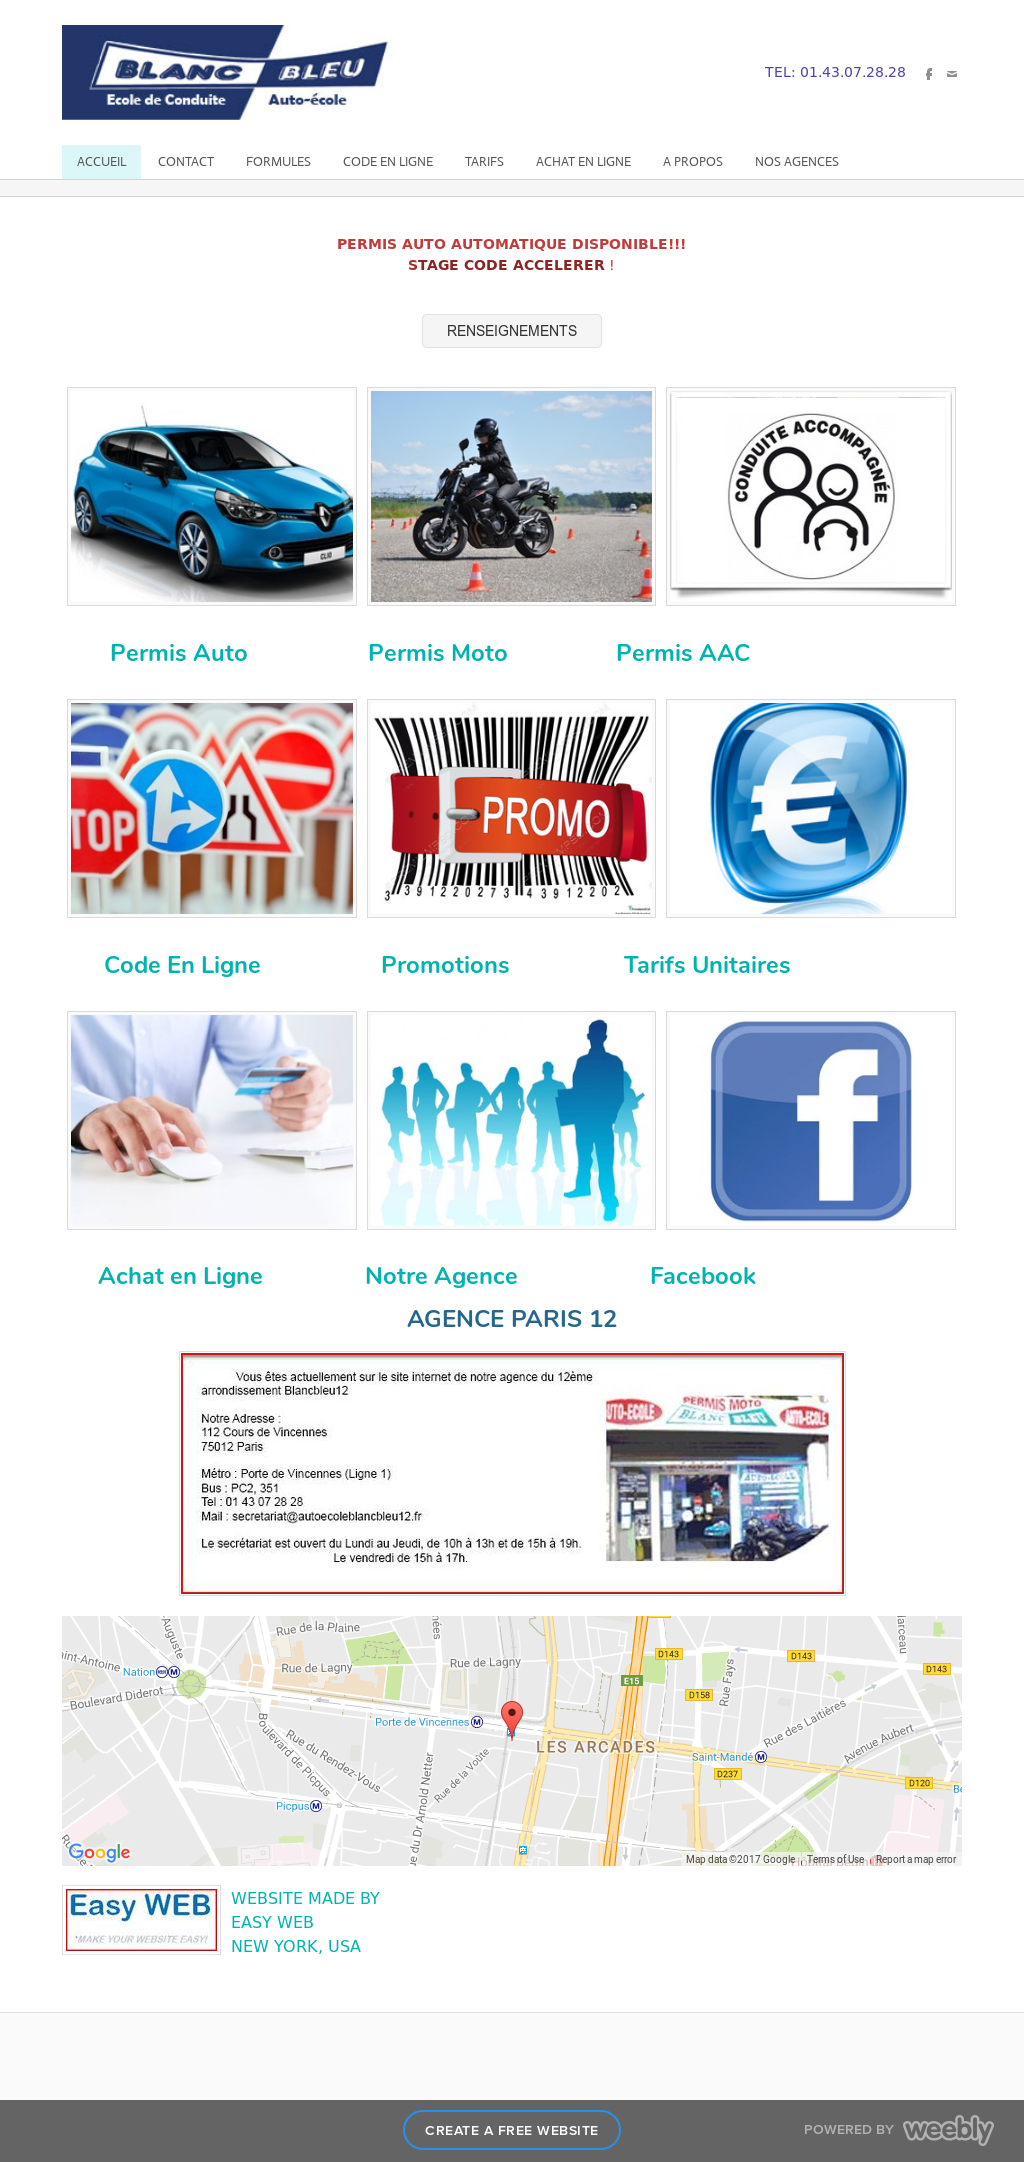 Auto Ecole Blanc Bleu 12 Competitors, Revenue and Employees - Owler ... 636f43d97c7b